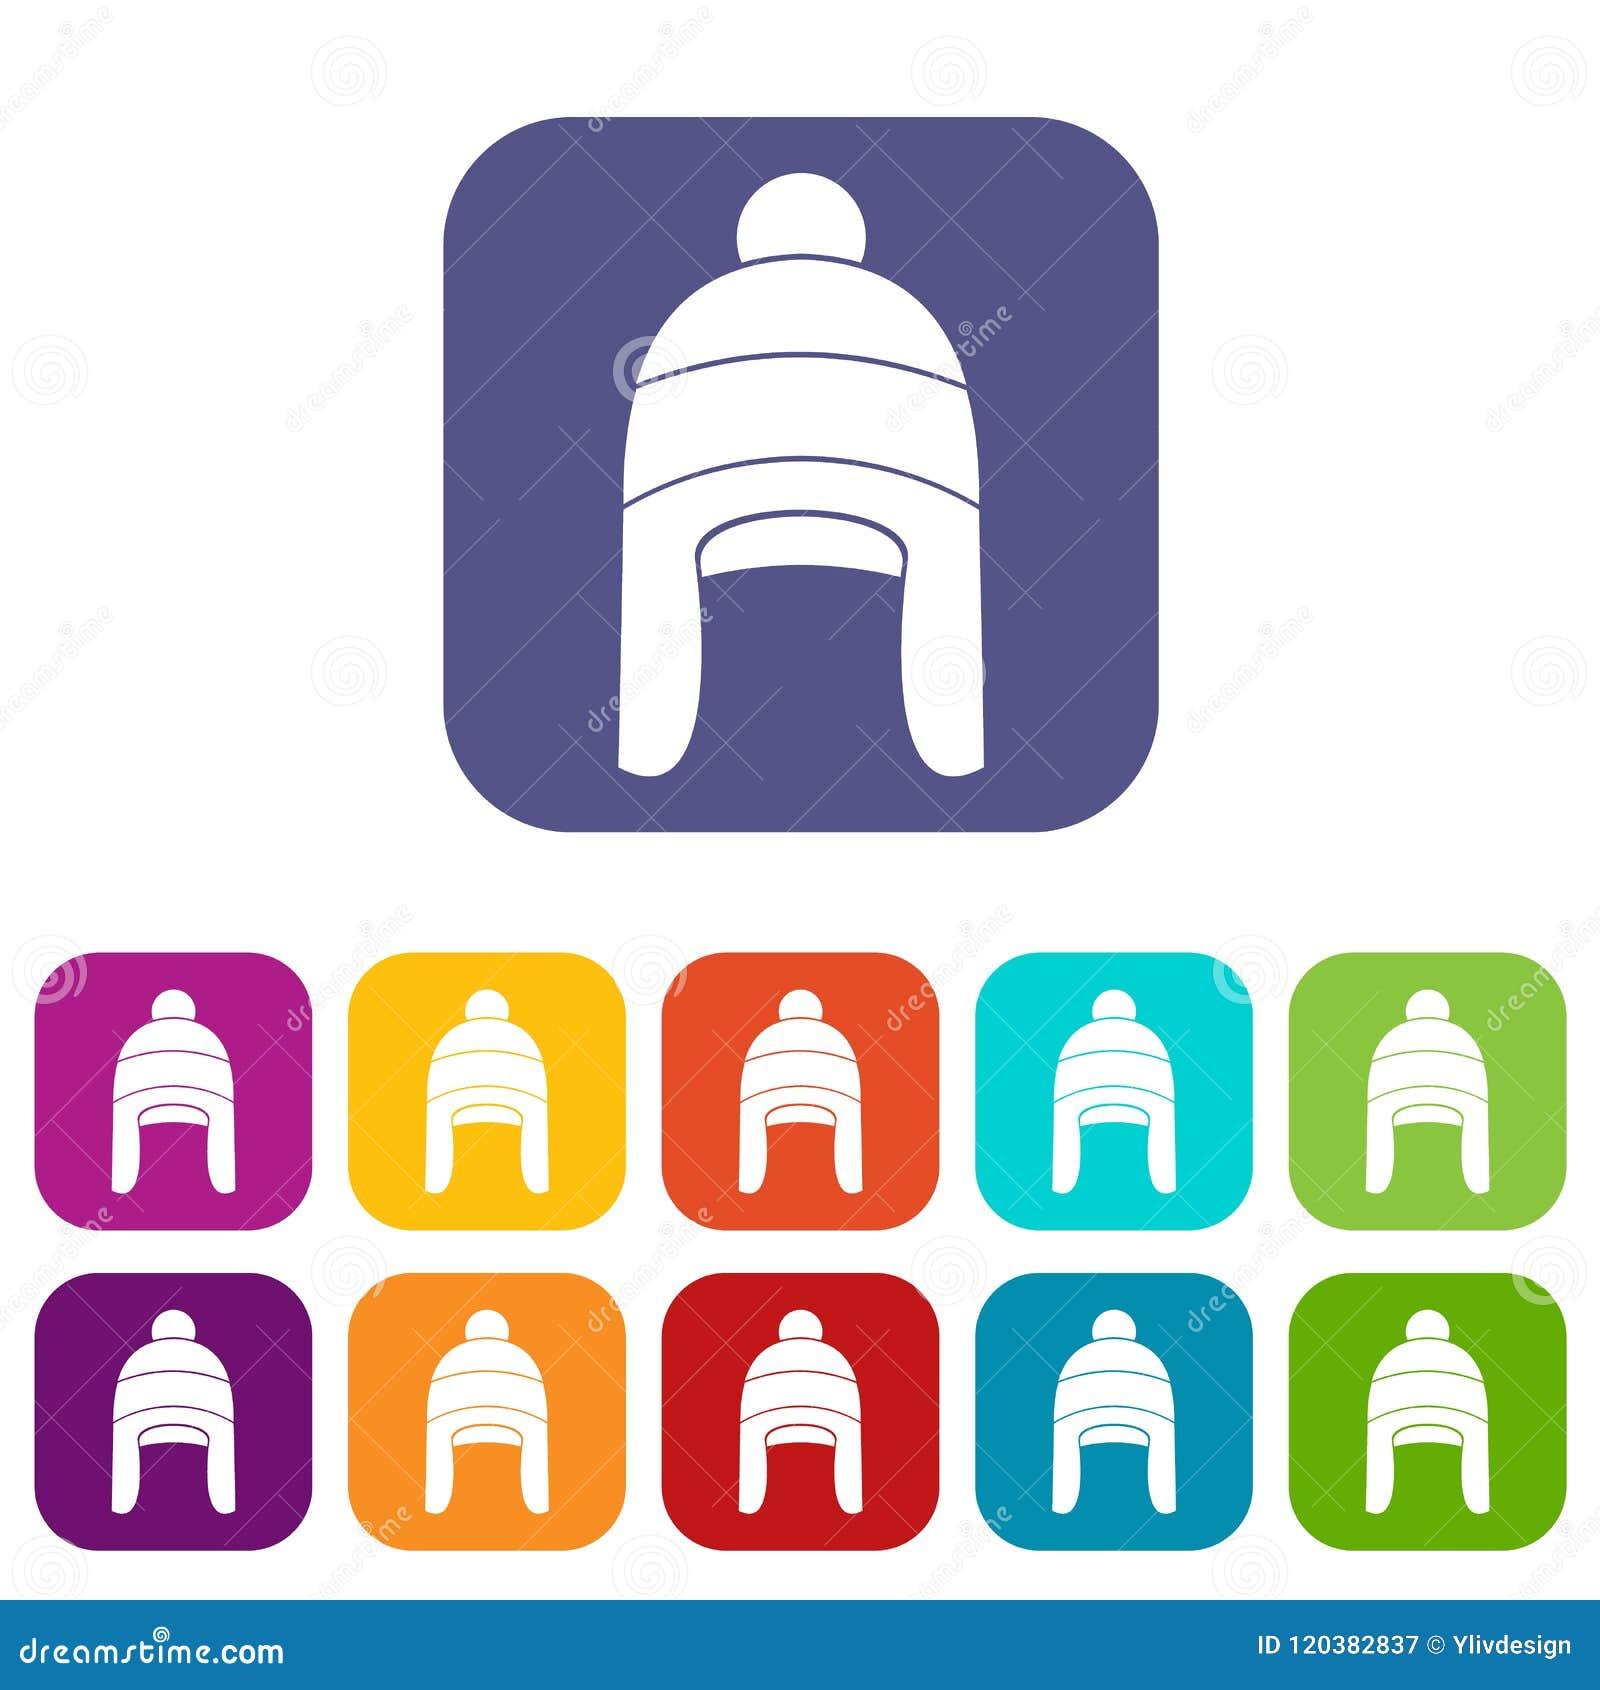 505c454fbc4 Winter hat icons set stock vector. Illustration of season - 120382837